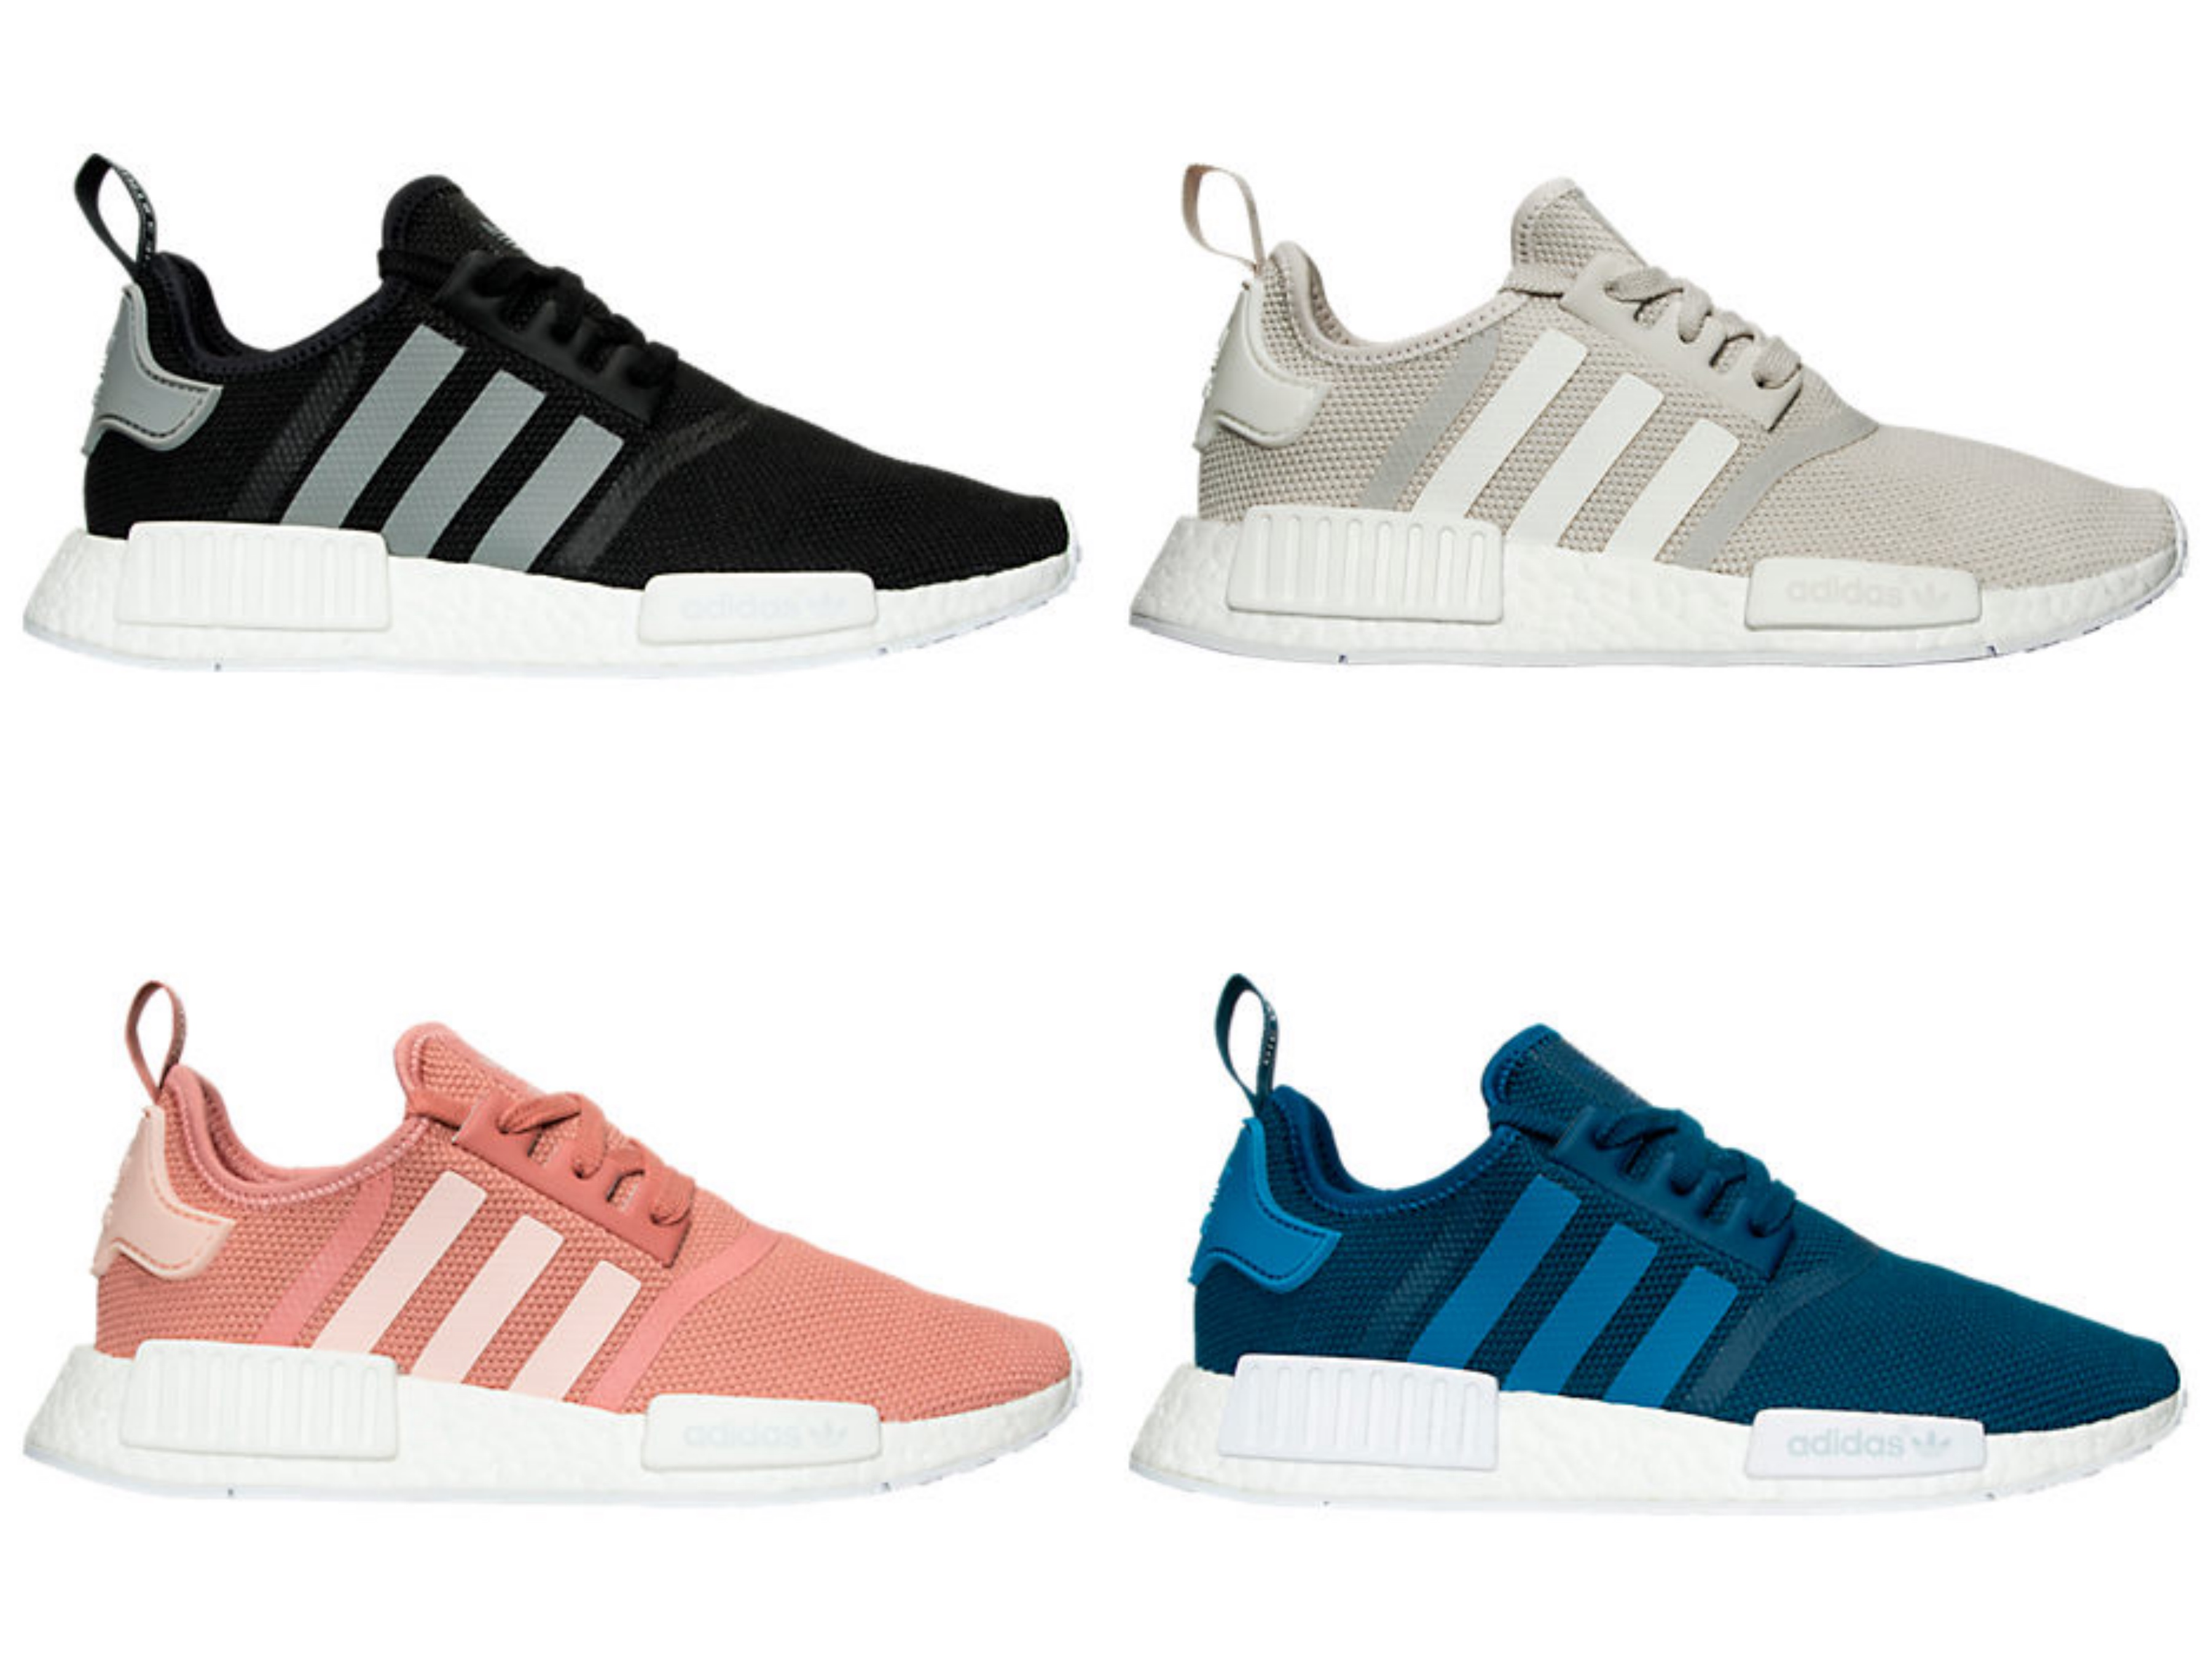 c1dbf10259c1 The adidas NMD R1 Runner Has Restocked in Multiple Colorways ...